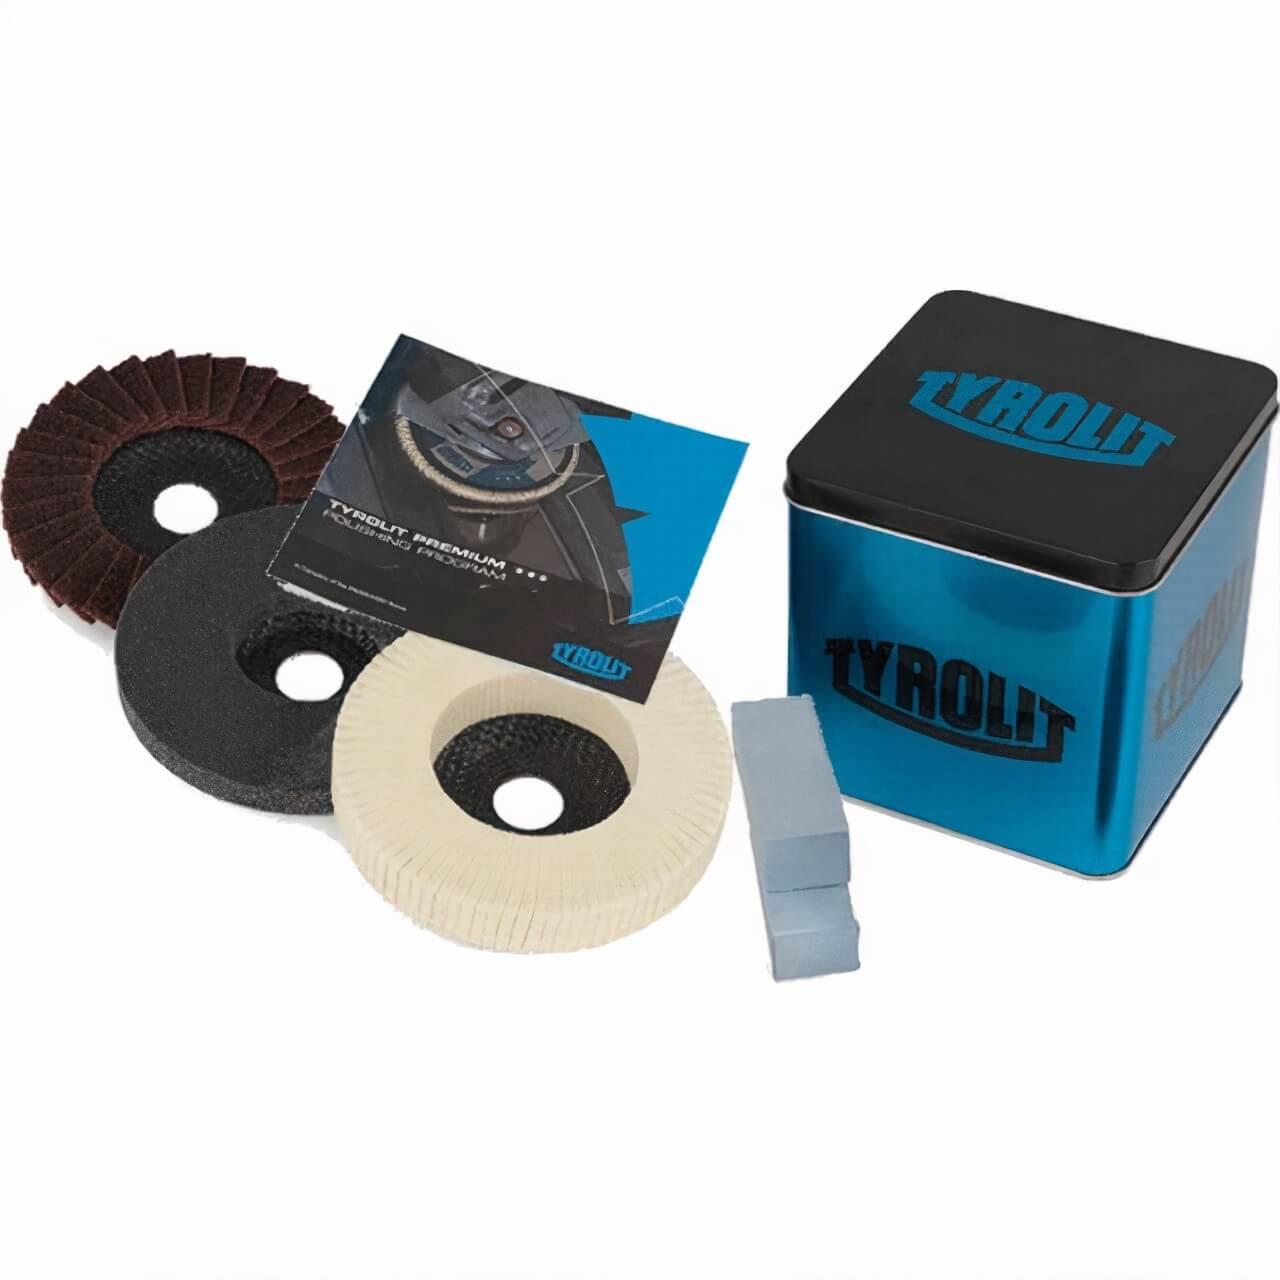 Tyrolit 125mm Premium Polishing Kit